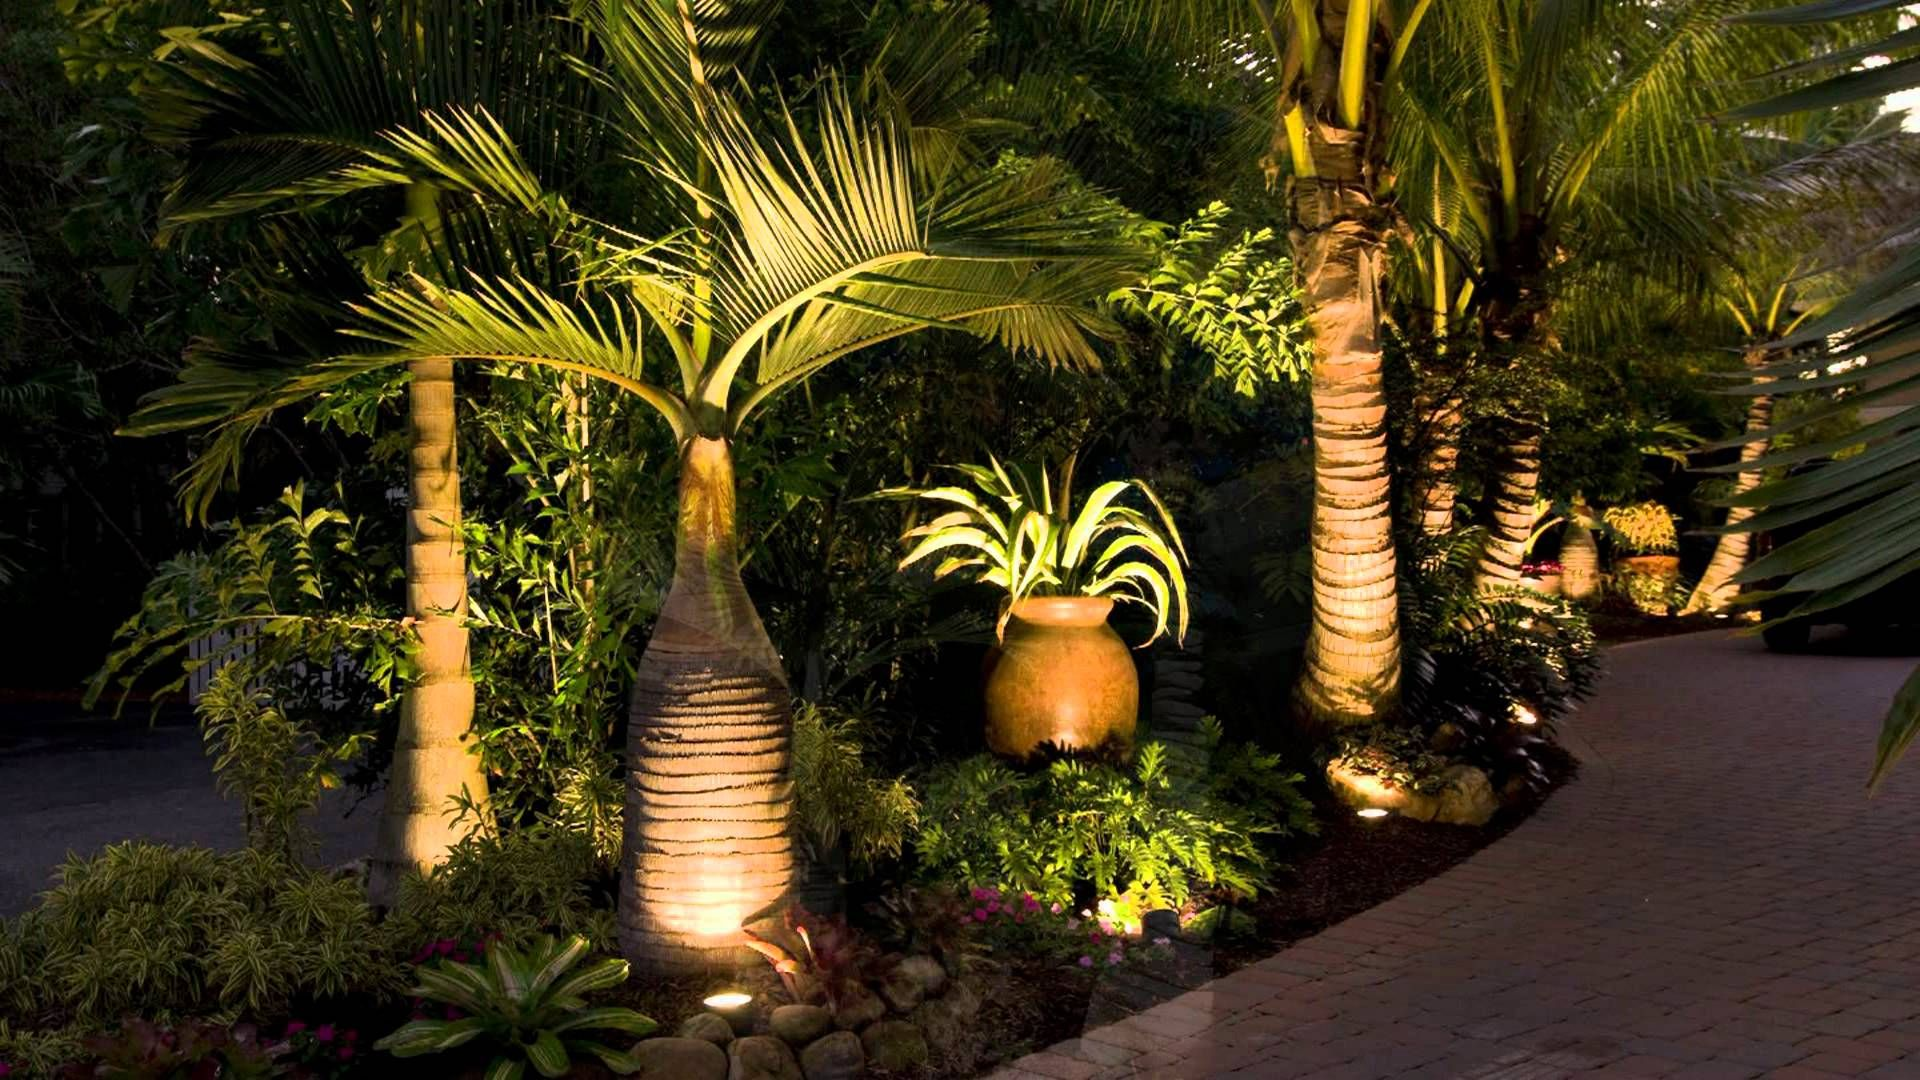 Landscaping Sarasota Florida with Tropical Palm Trees ...